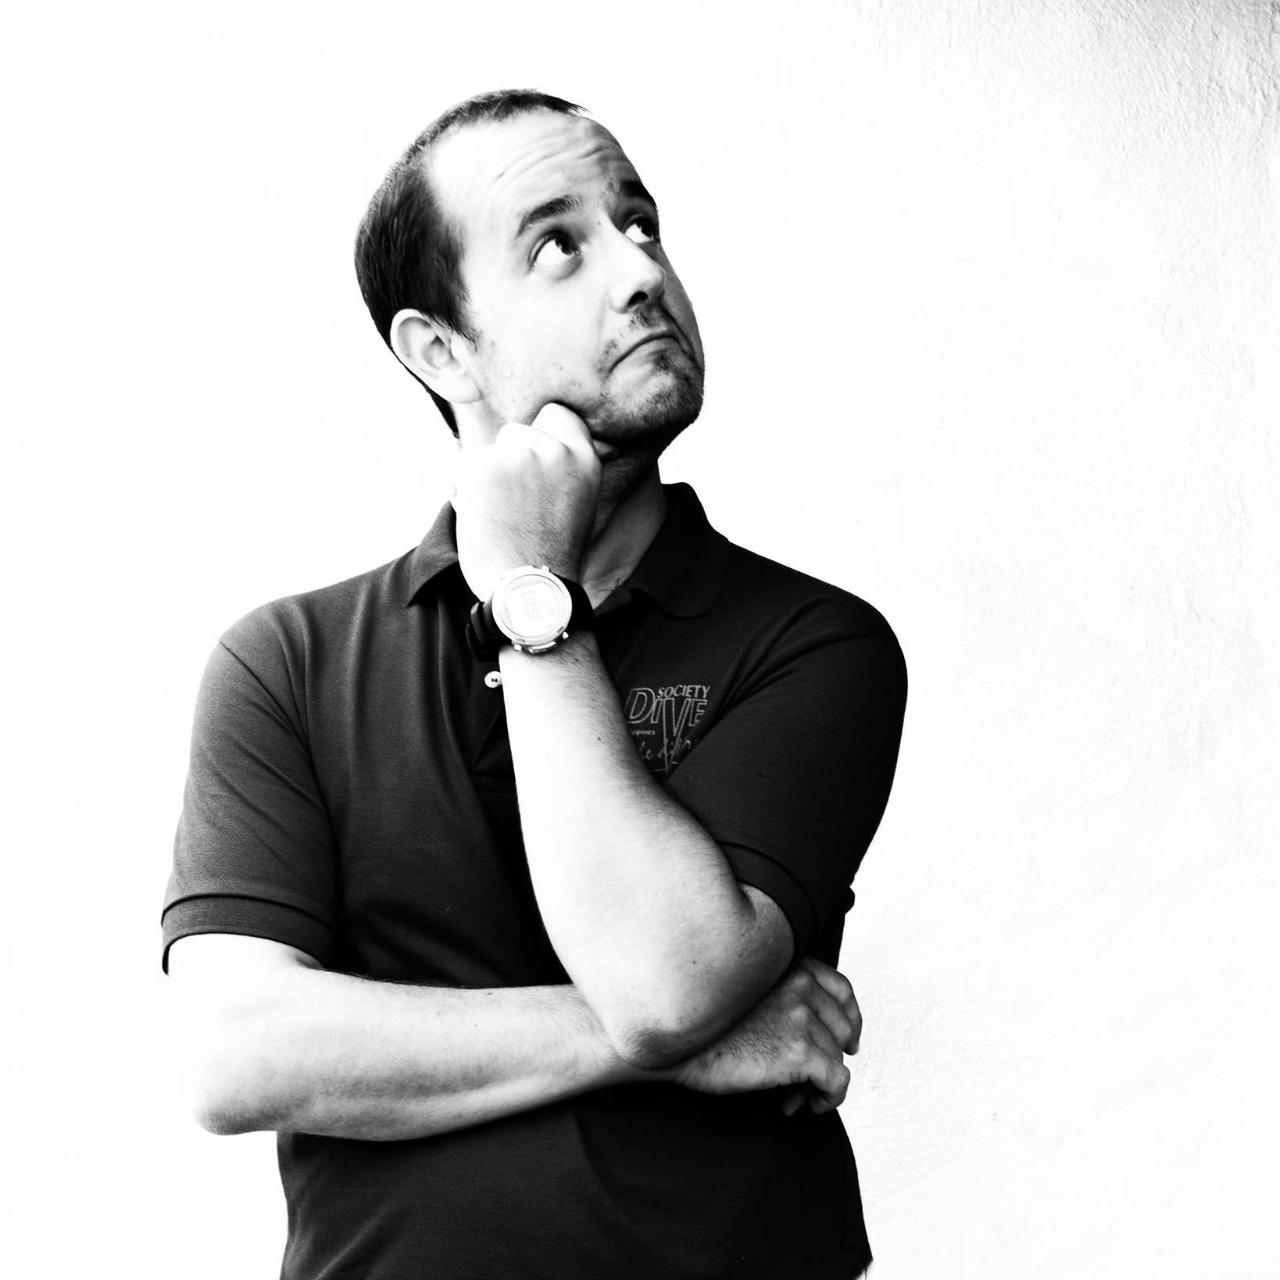 Florian Monn